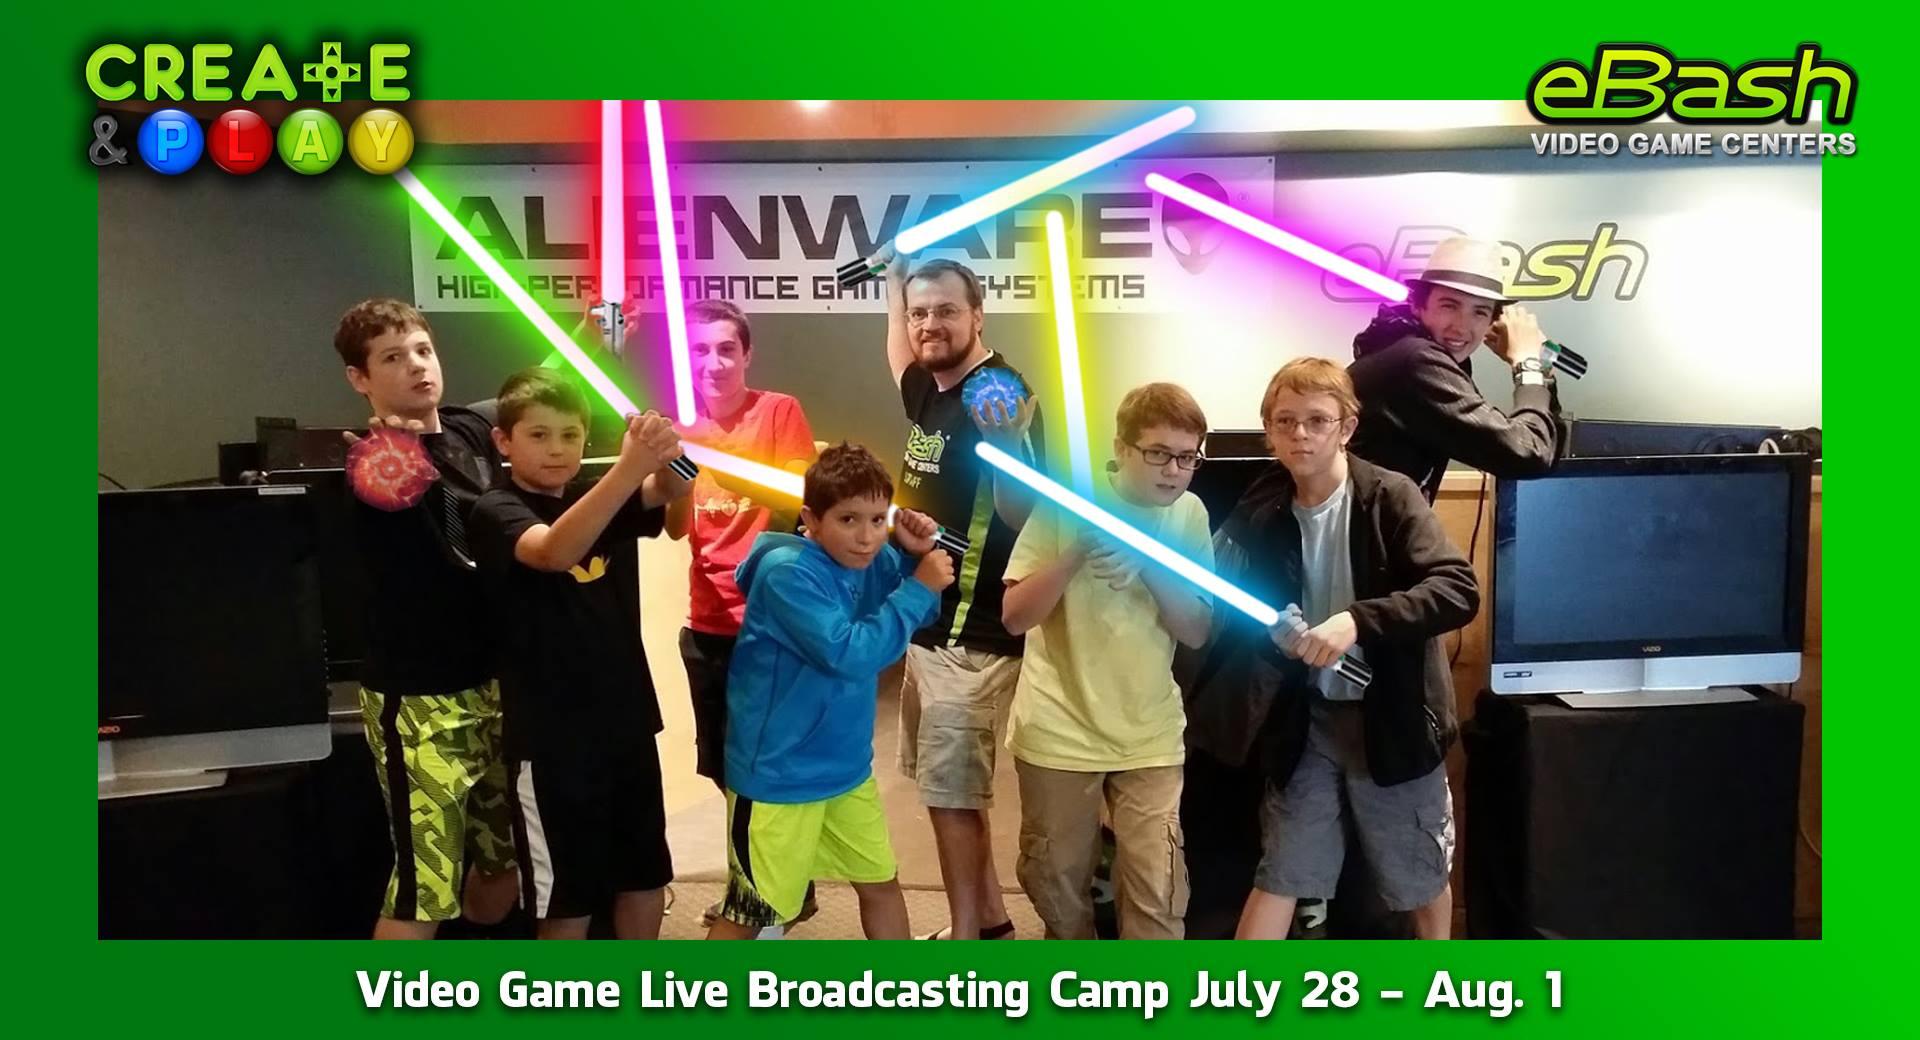 Technology summer camp provides an alternative way to spend summer